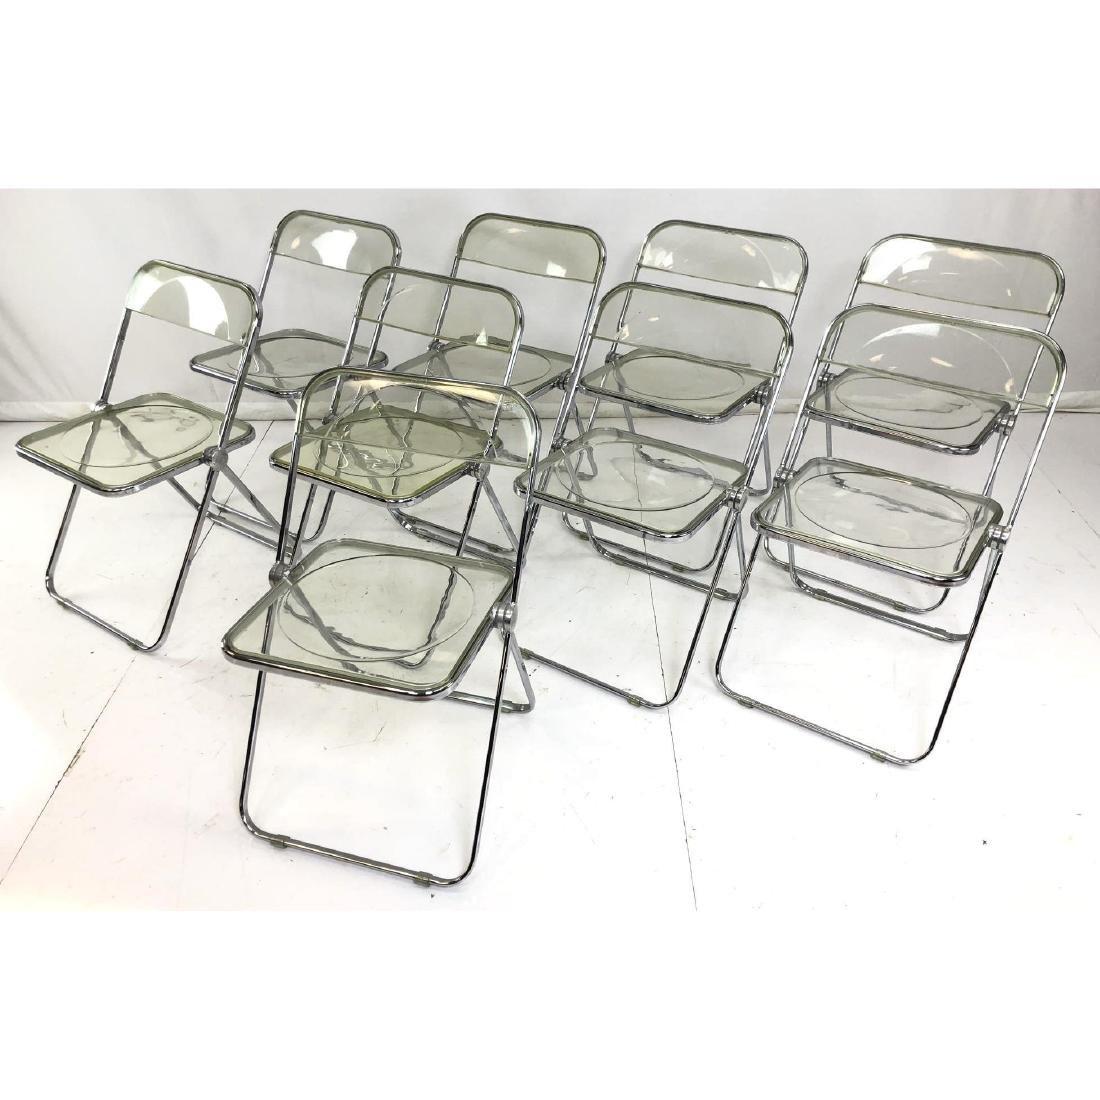 Set 9 Lucite Italian Folding Chairs. Modernist Se